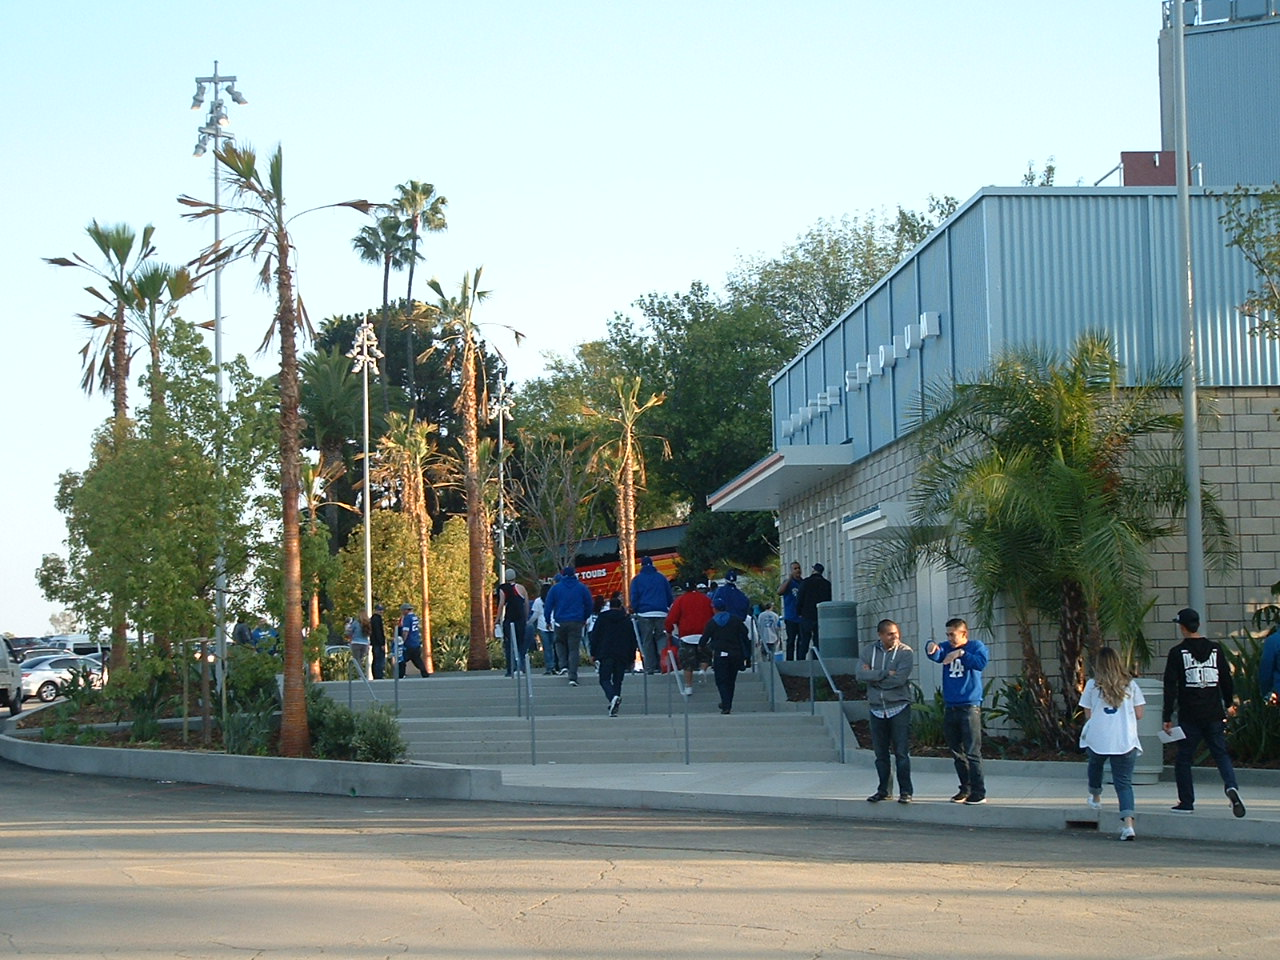 dodger stadium plazas      dodger insider